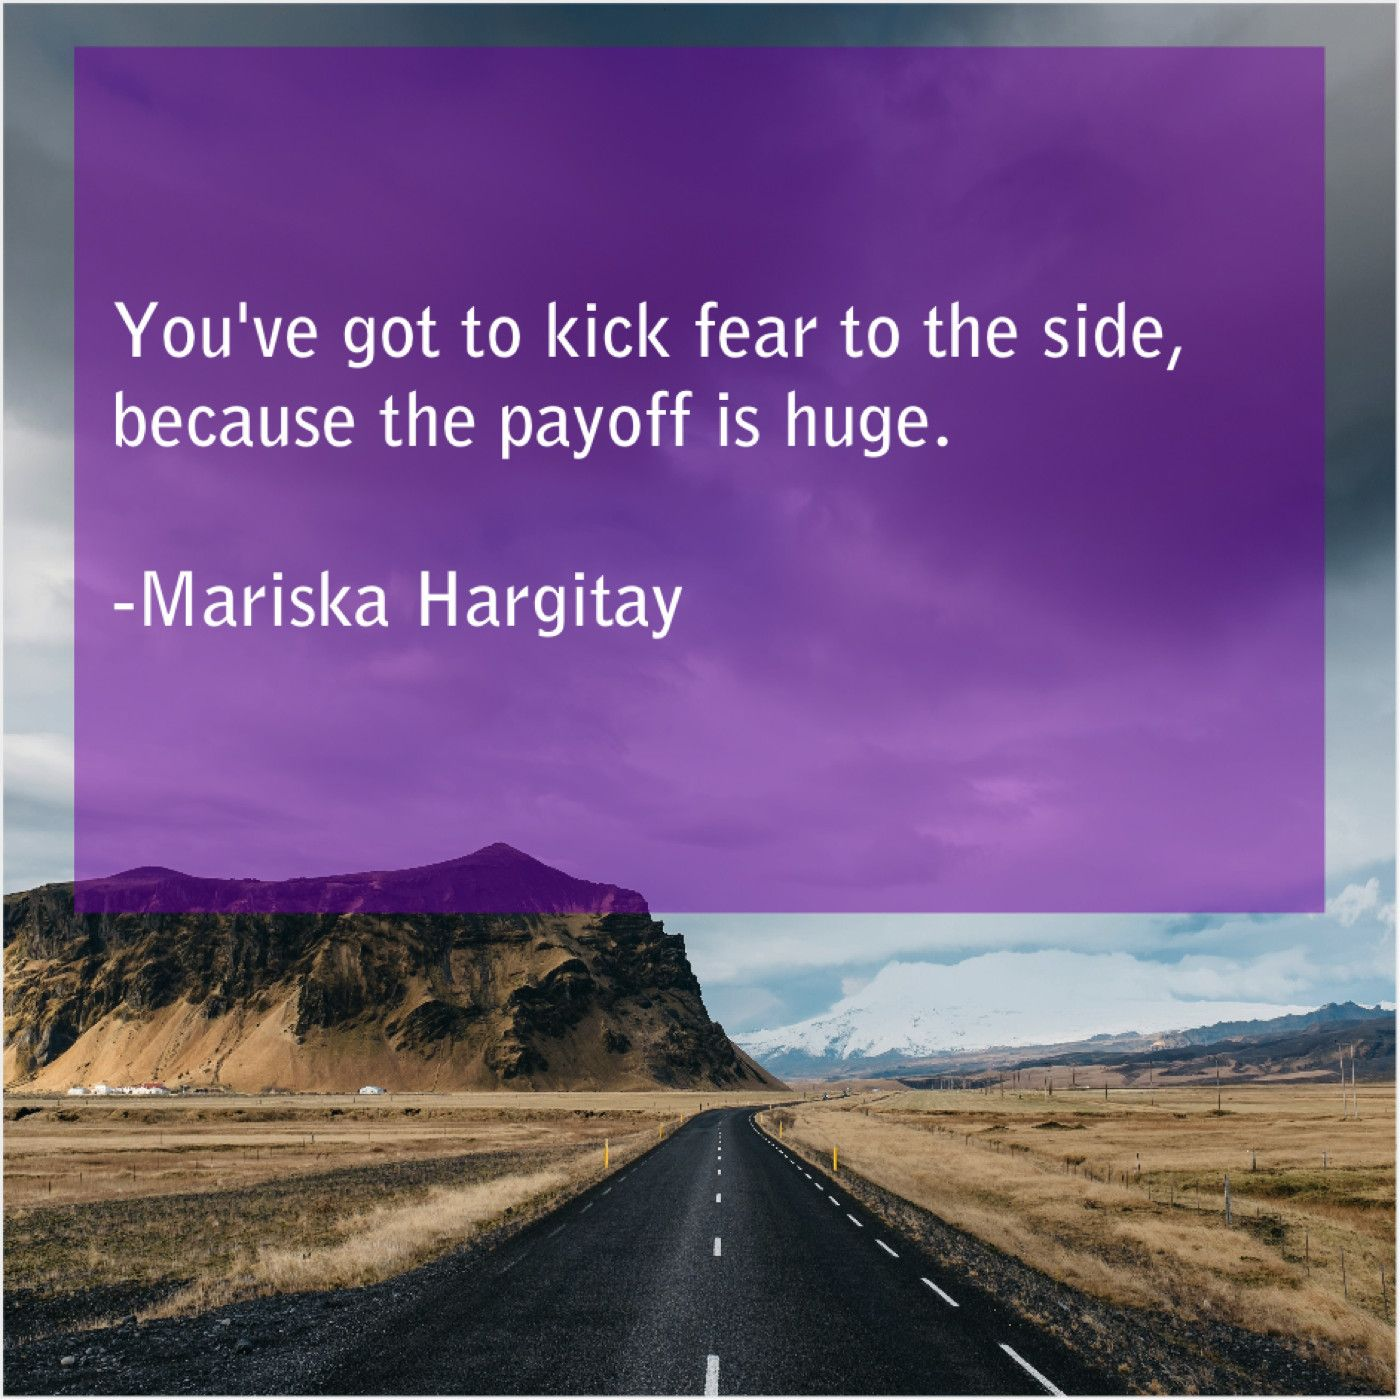 Mariska Hargitay Youve Got To Kick Fear Arthur Schopenhauer Life Ciara And I